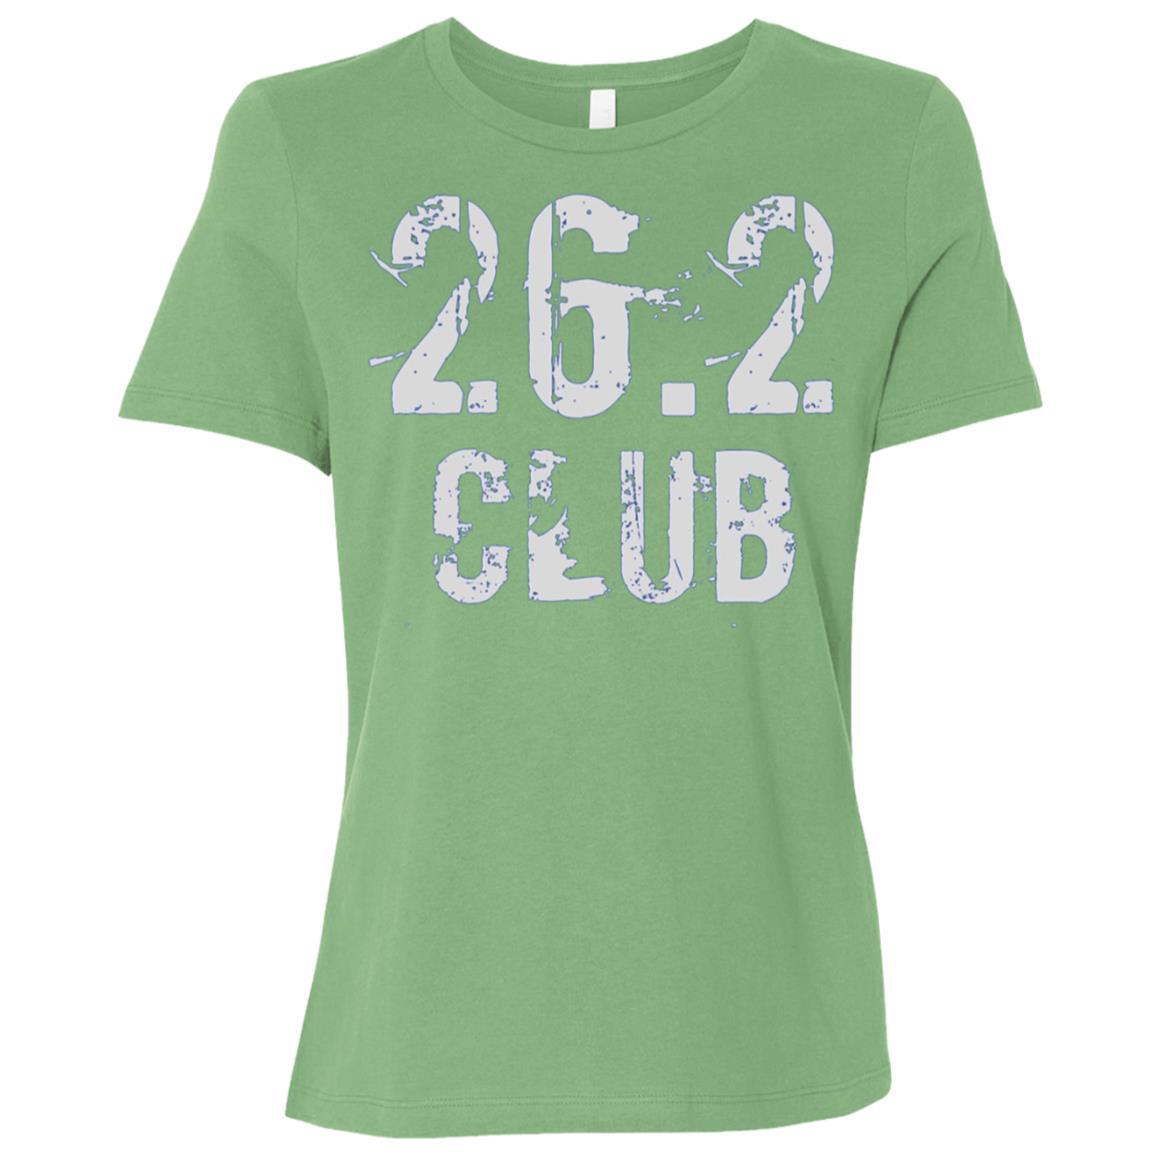 26 Marathon Running Marathon Runners Gifts Women Short Sleeve T-Shirt